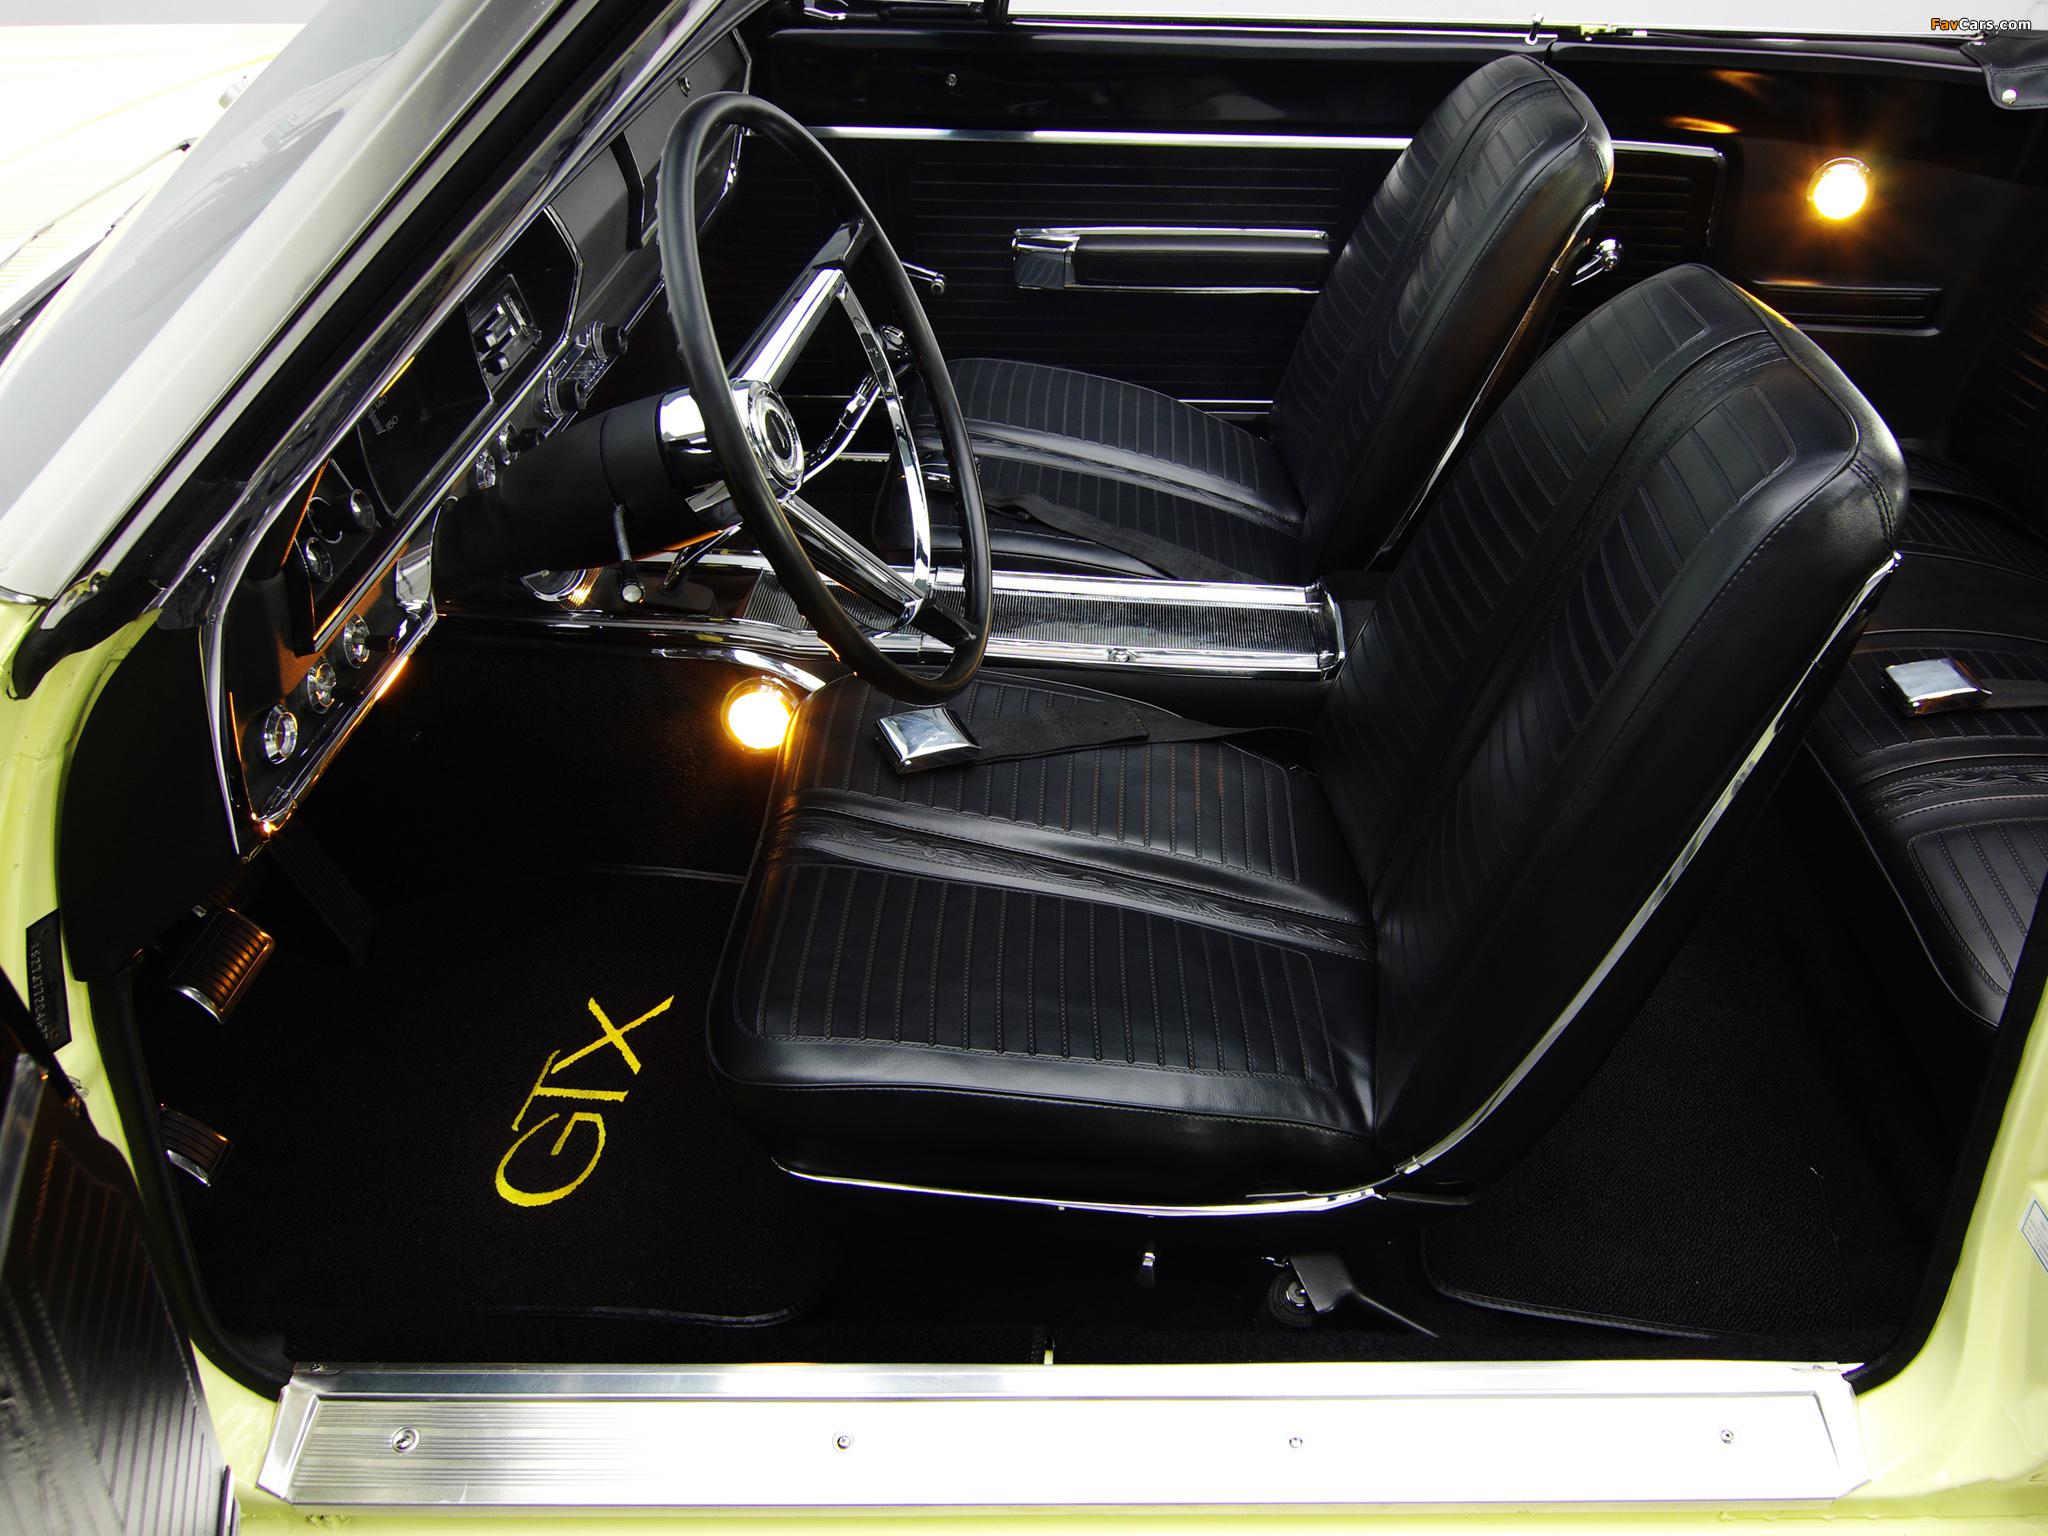 Plymouth Belvedere GTX 426 Hemi Convertible 1967 wallpapers (2048 x 1536)